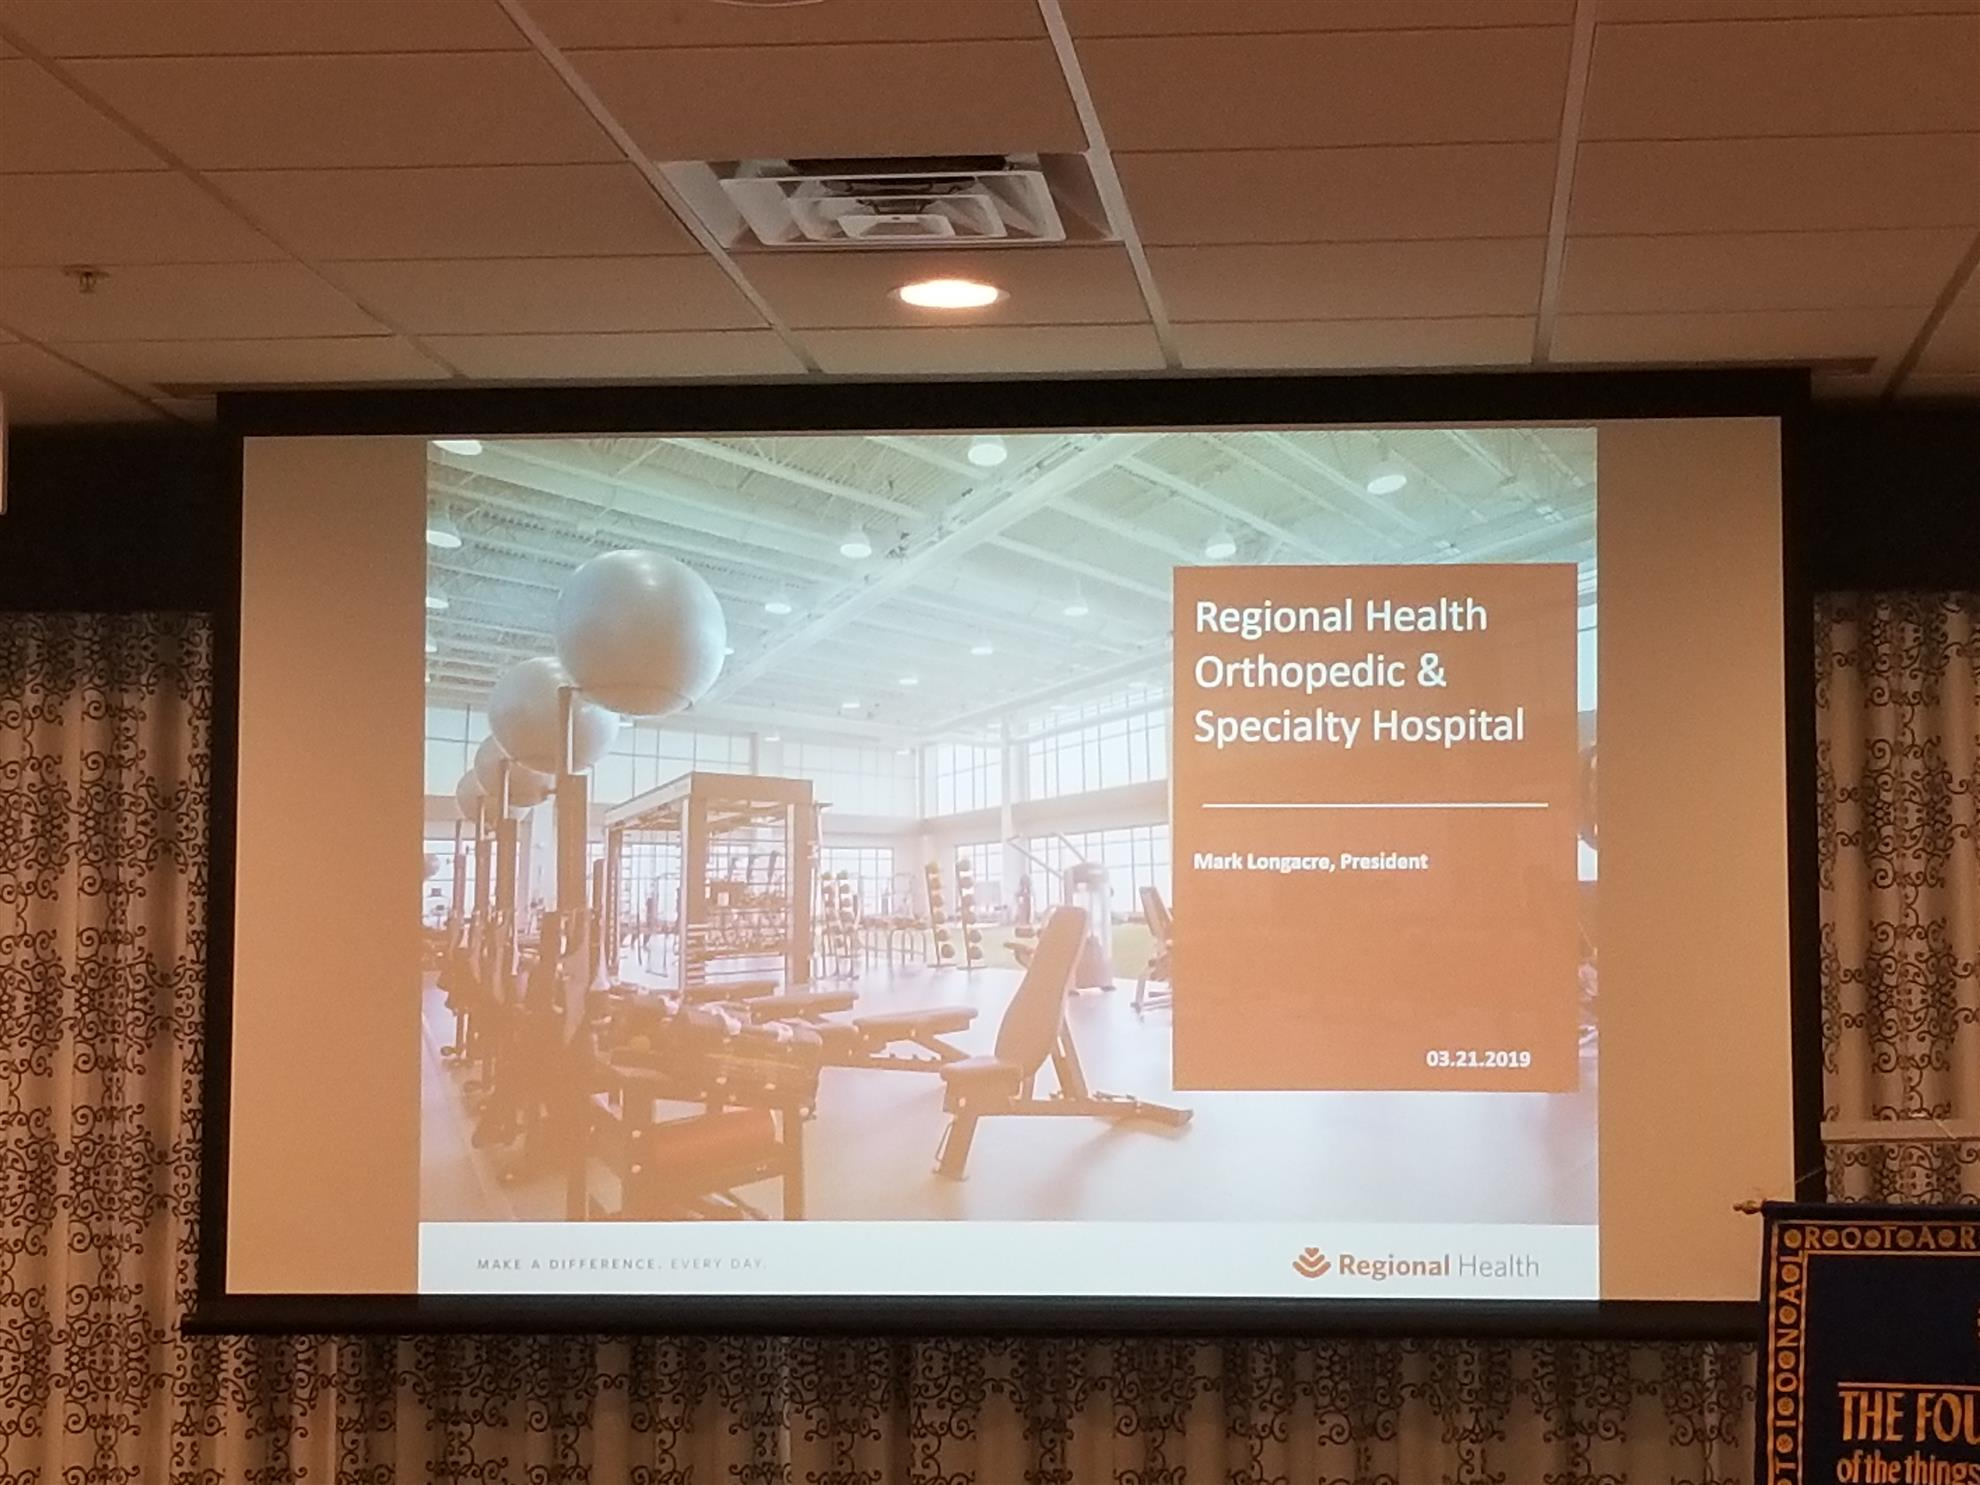 Regional Health Orthopedic & Specialty Hospital